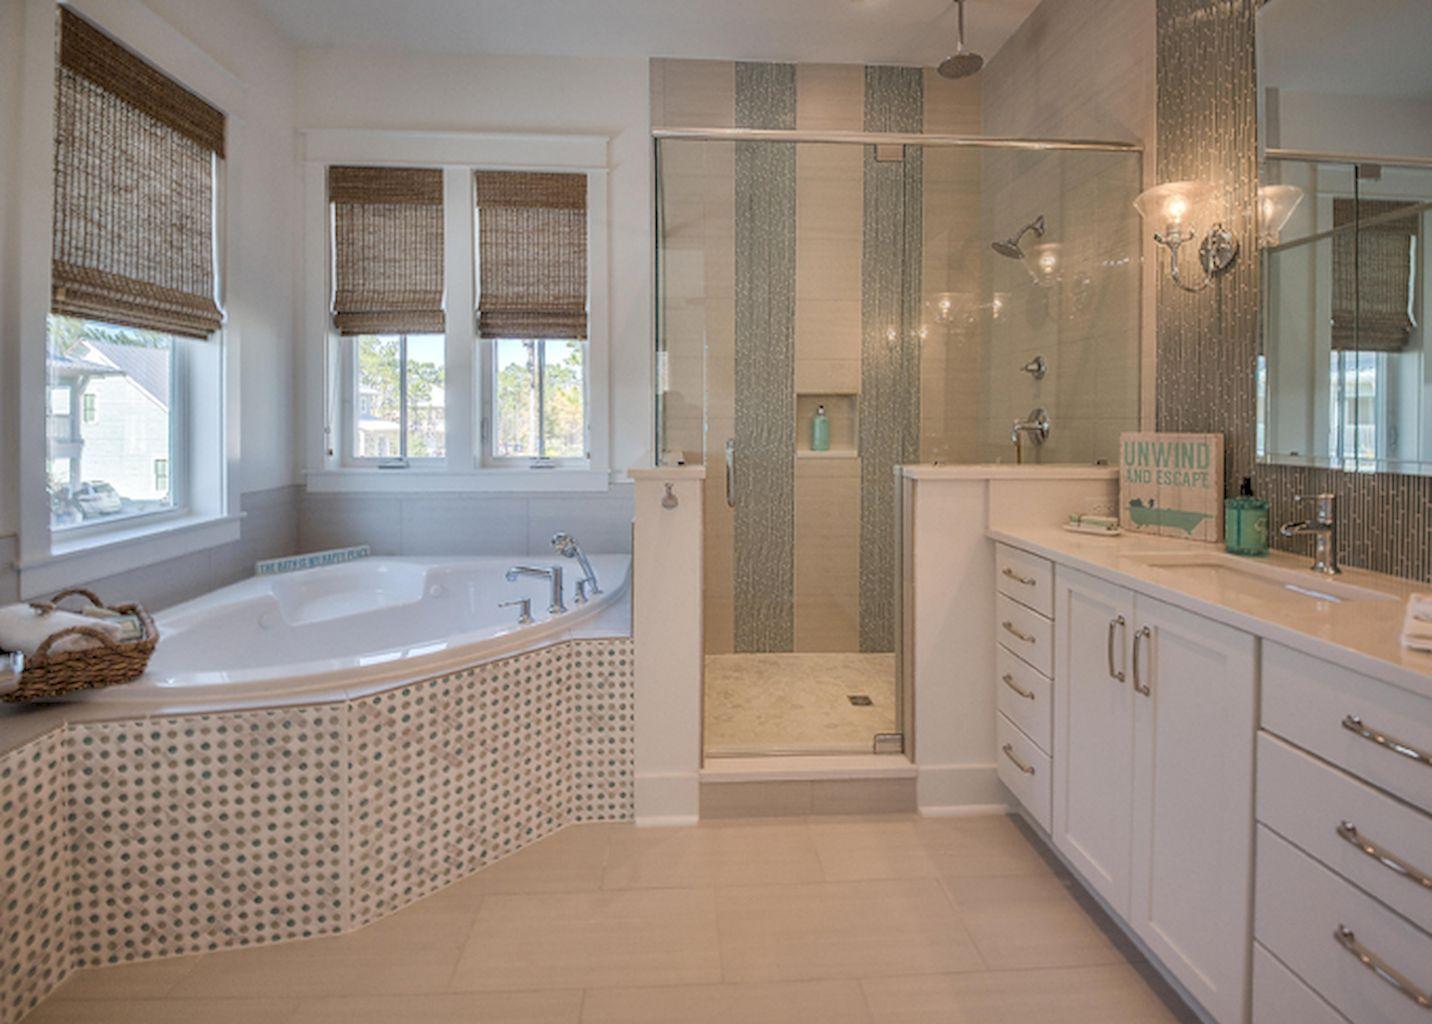 Best Inspire Coastal Bathroom Remodel Design Ideas Coastal - Bathroom remodeling panama city beach